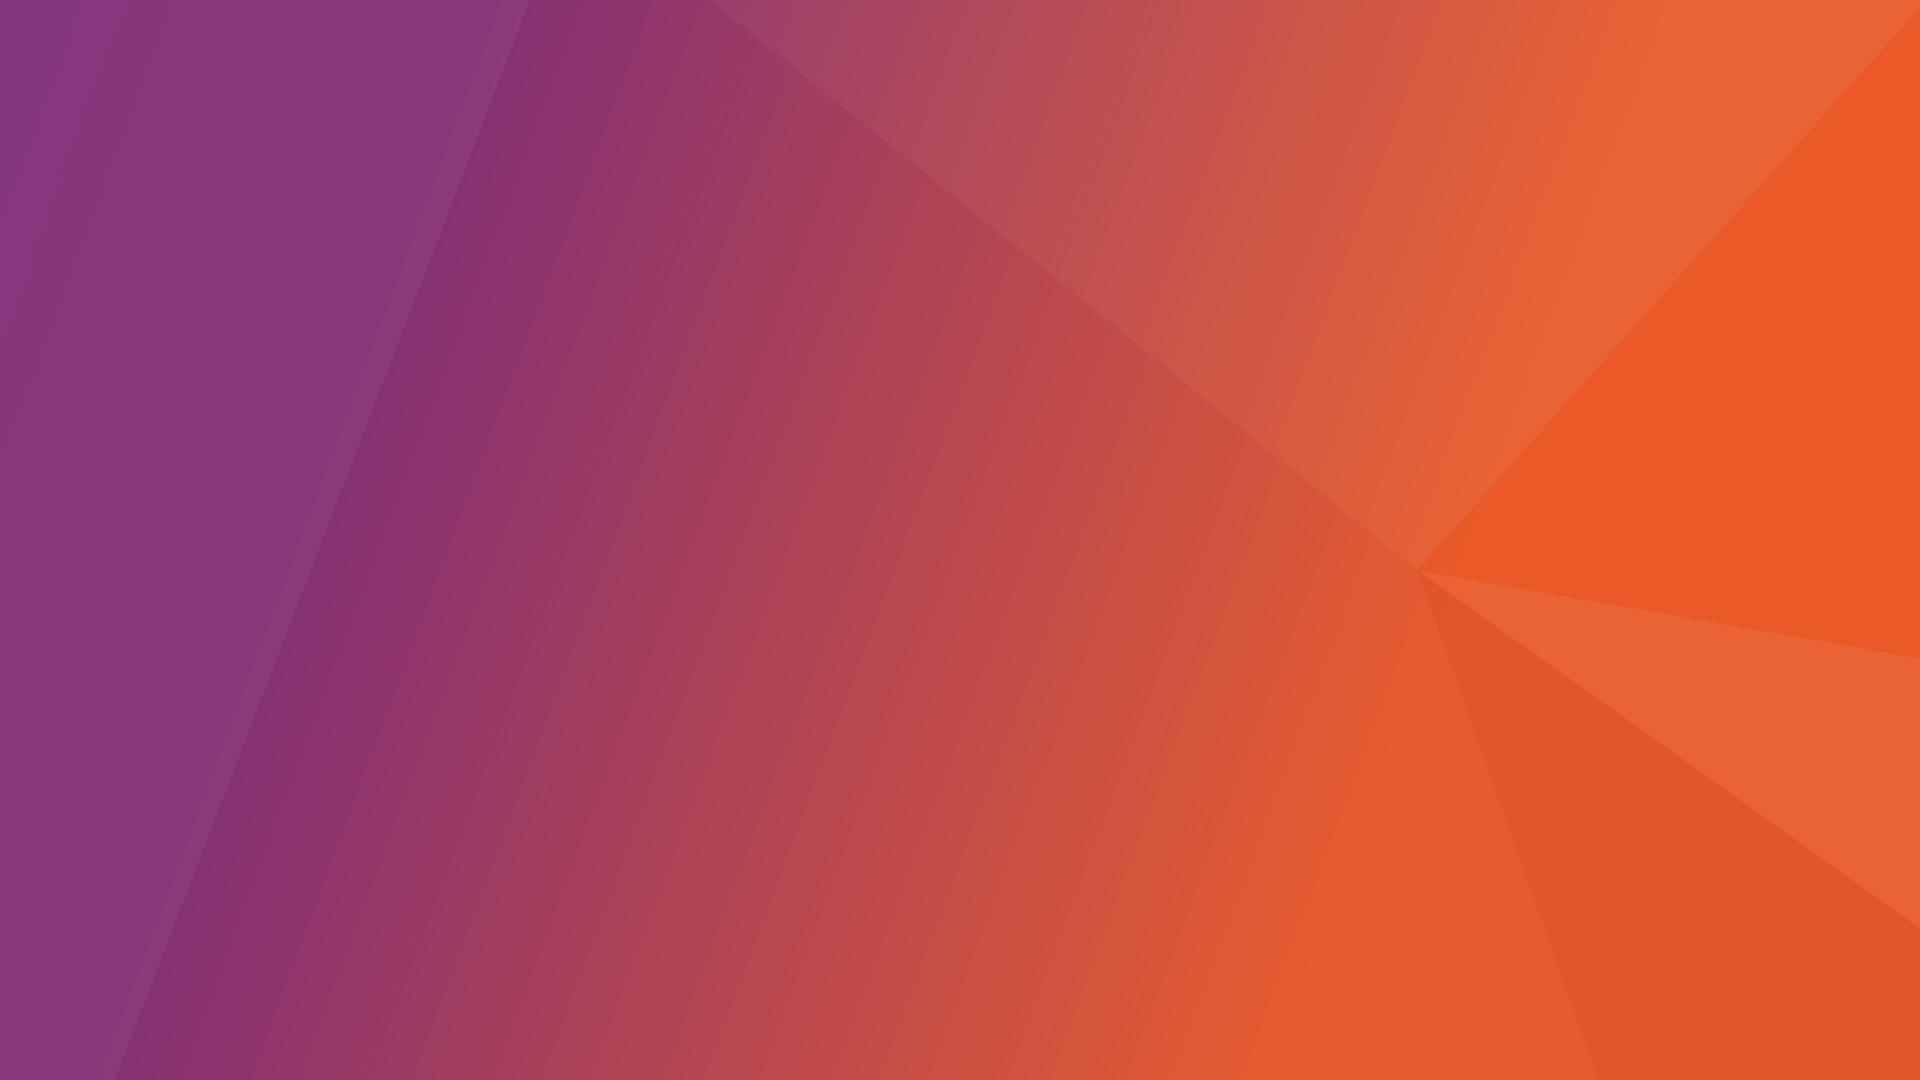 Ubuntu Wallpaper HD